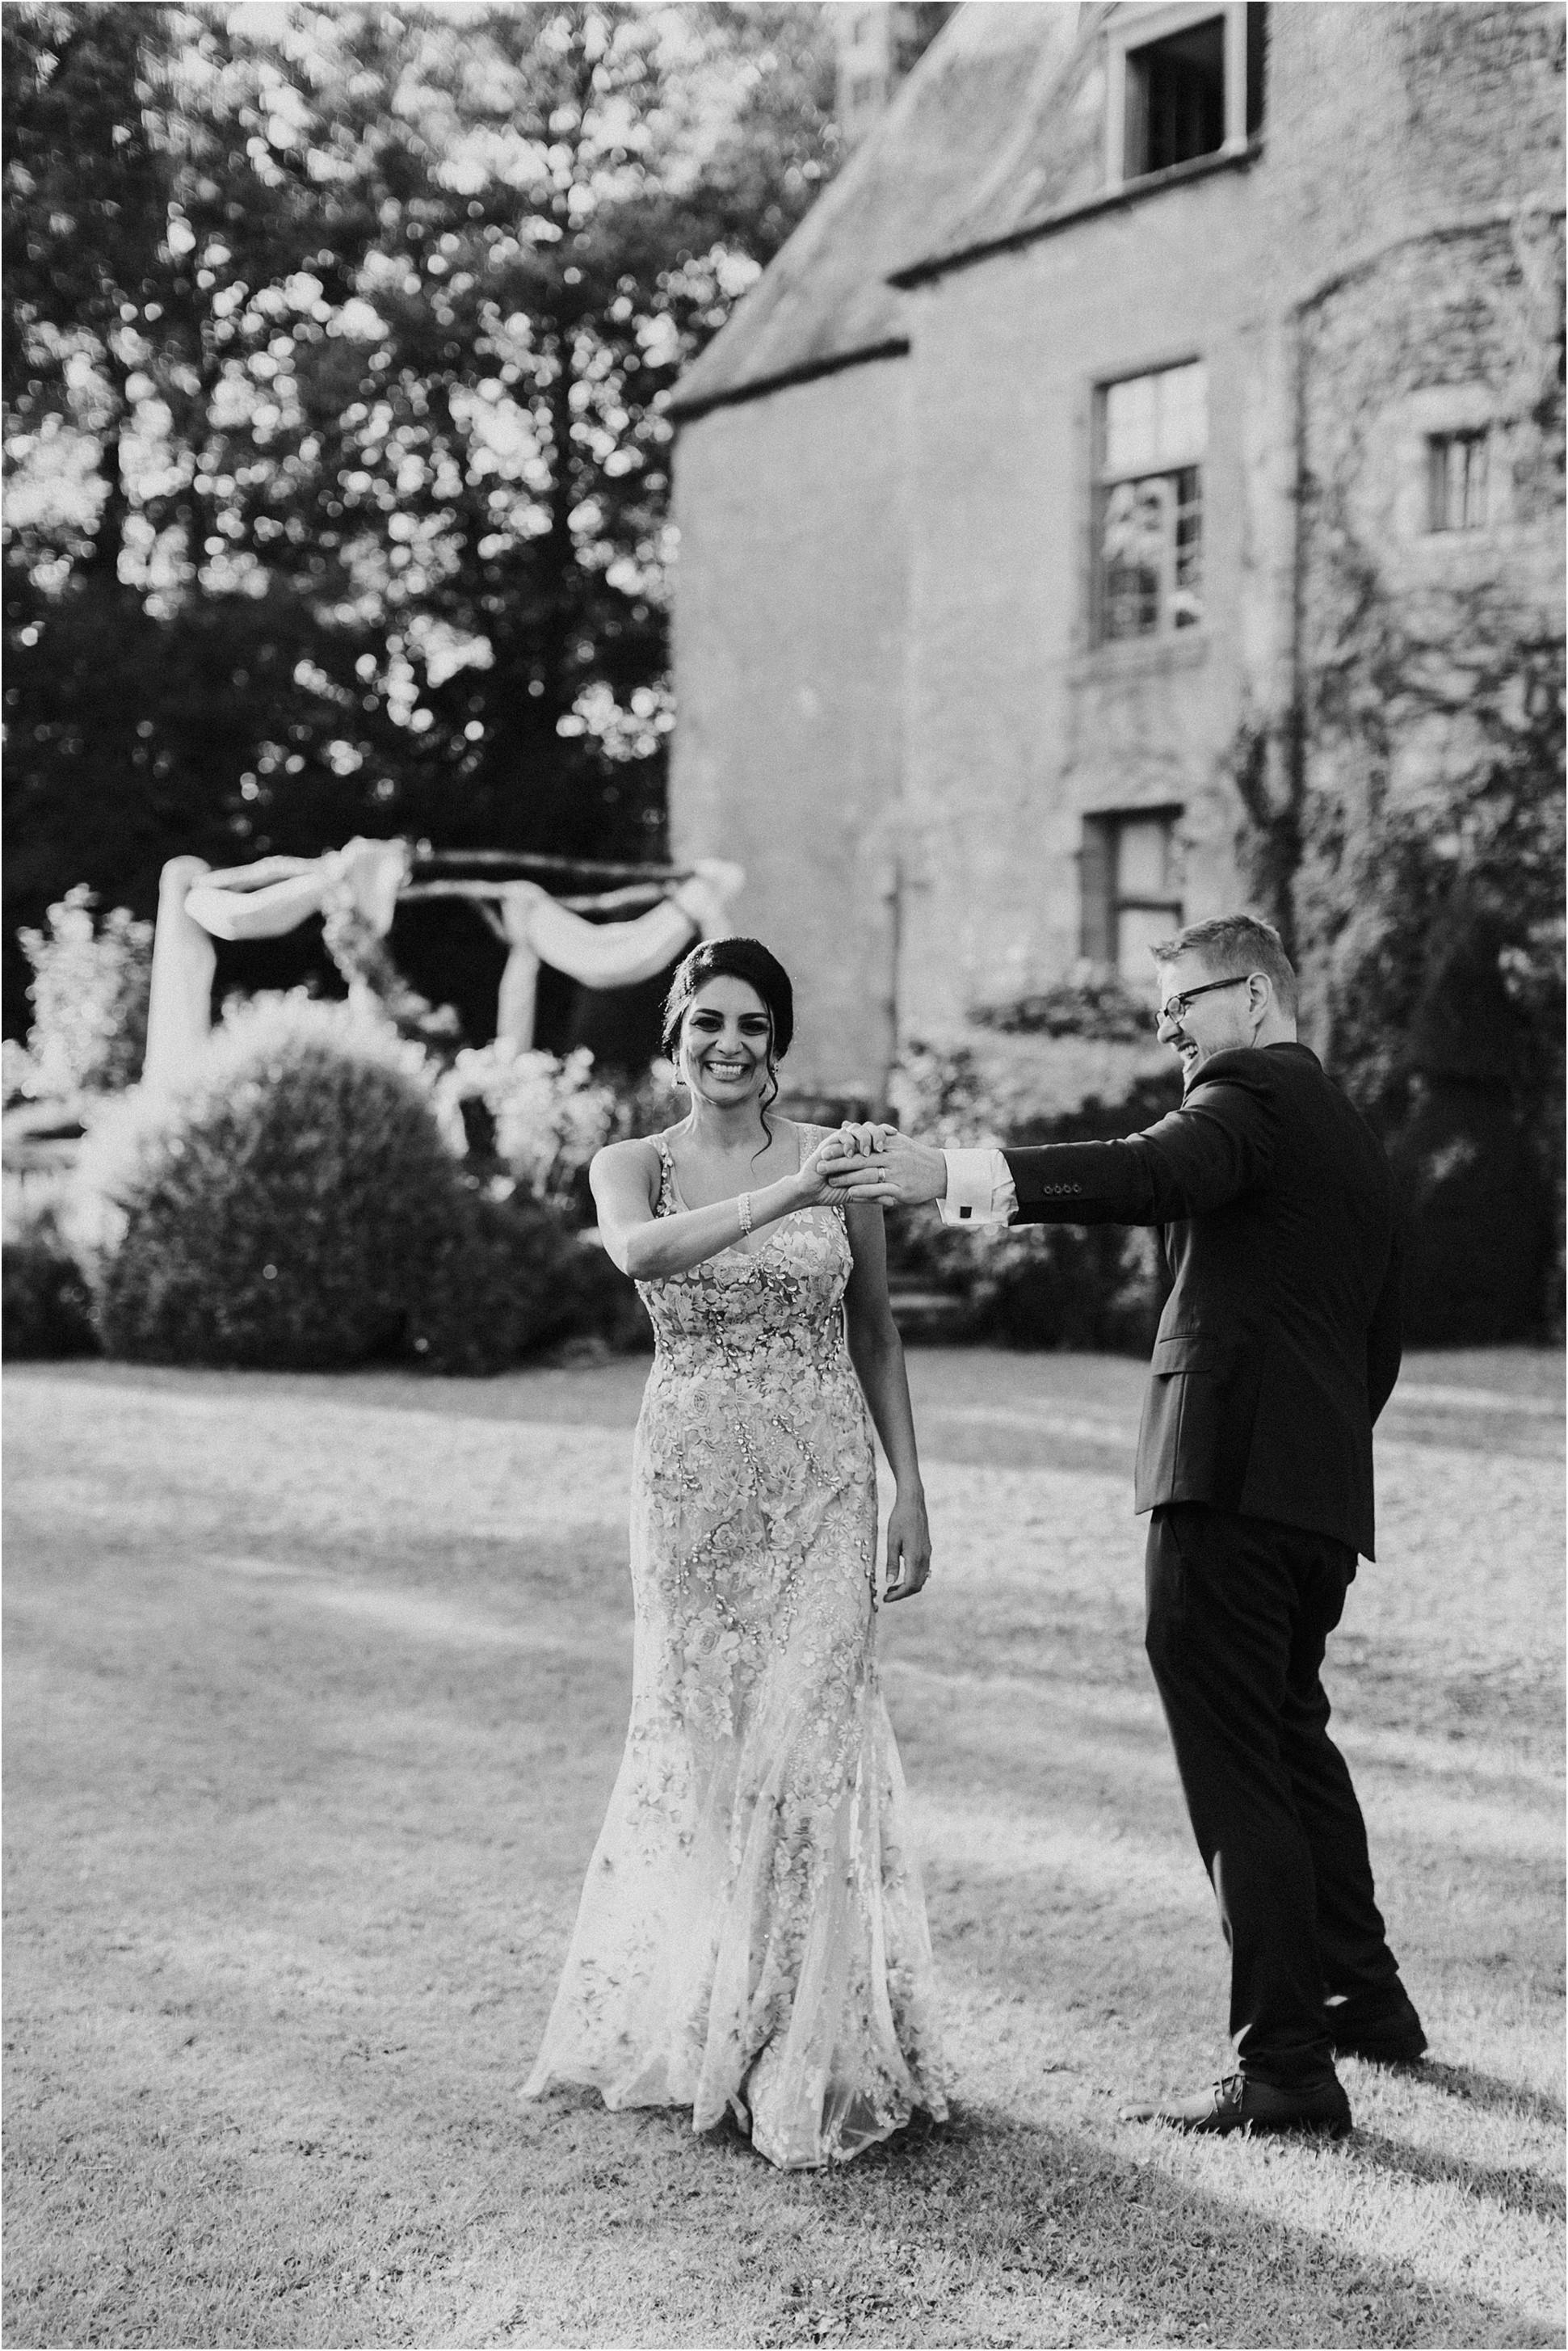 Kateryna-photos-photographe-mariage-chateau-st-paterne-mayenne-normandie_0171.jpg